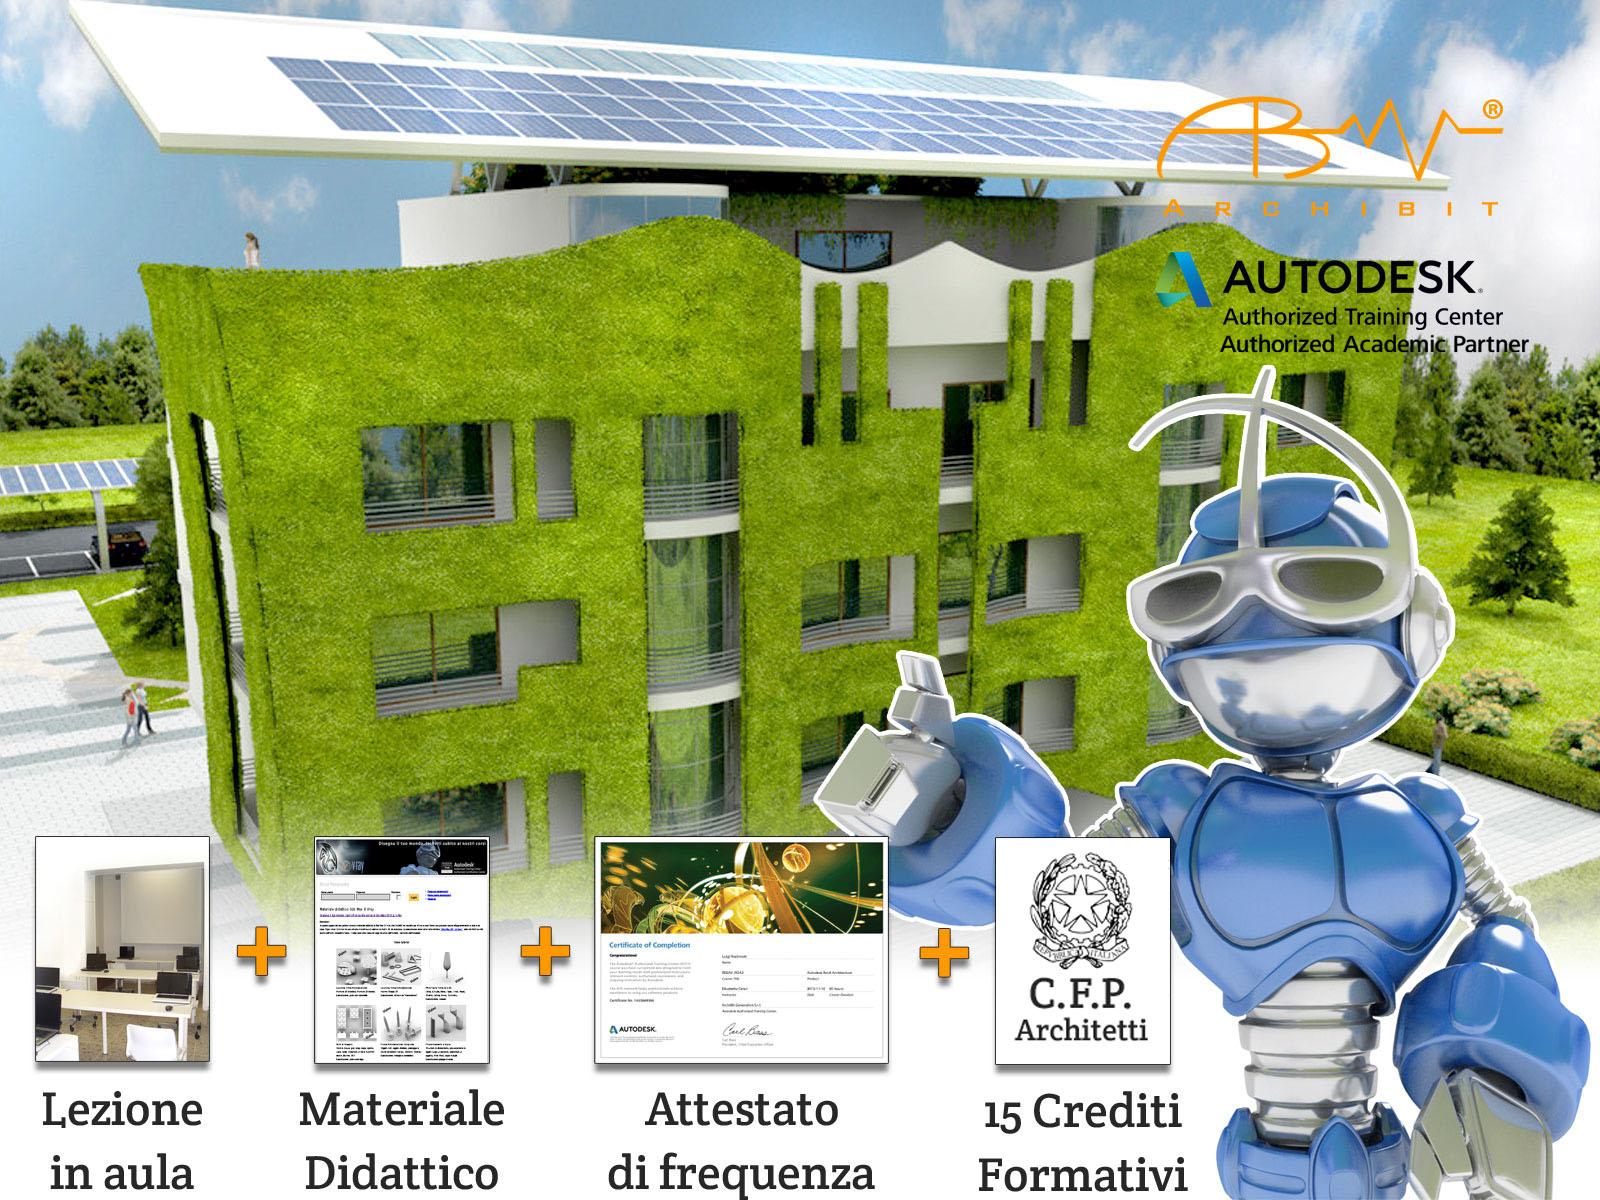 Corso Revit Base - Archibit Generation centro corsi Autodesk Roma